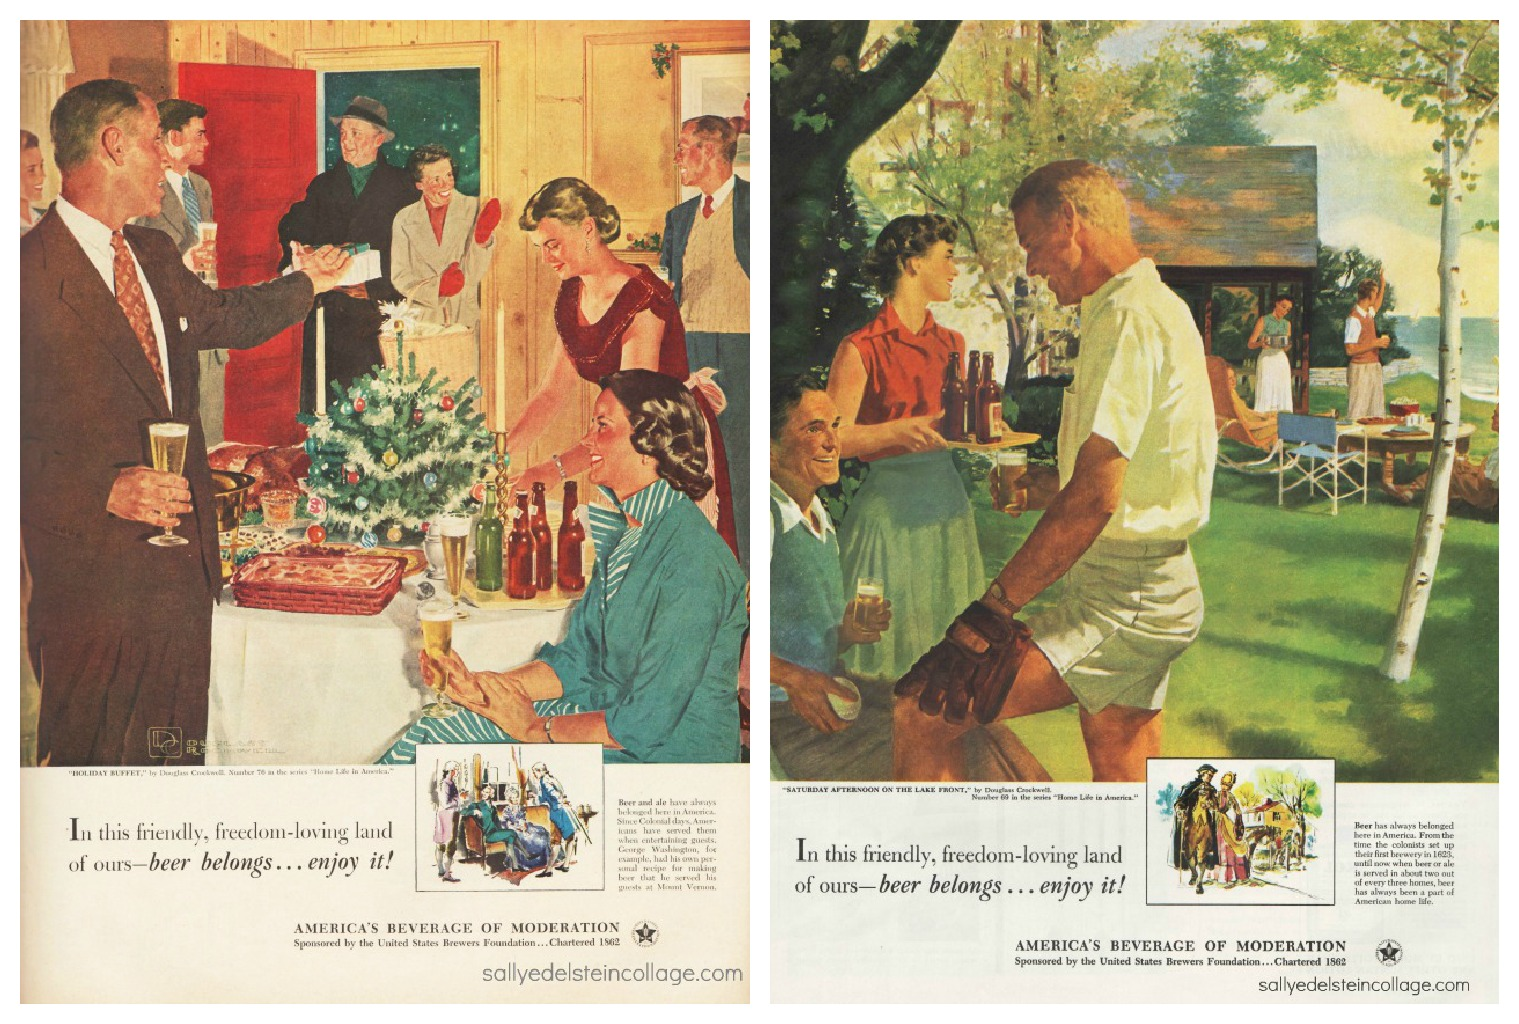 Vintage Illustrations Retro Beer Ads Suburbia 1950s